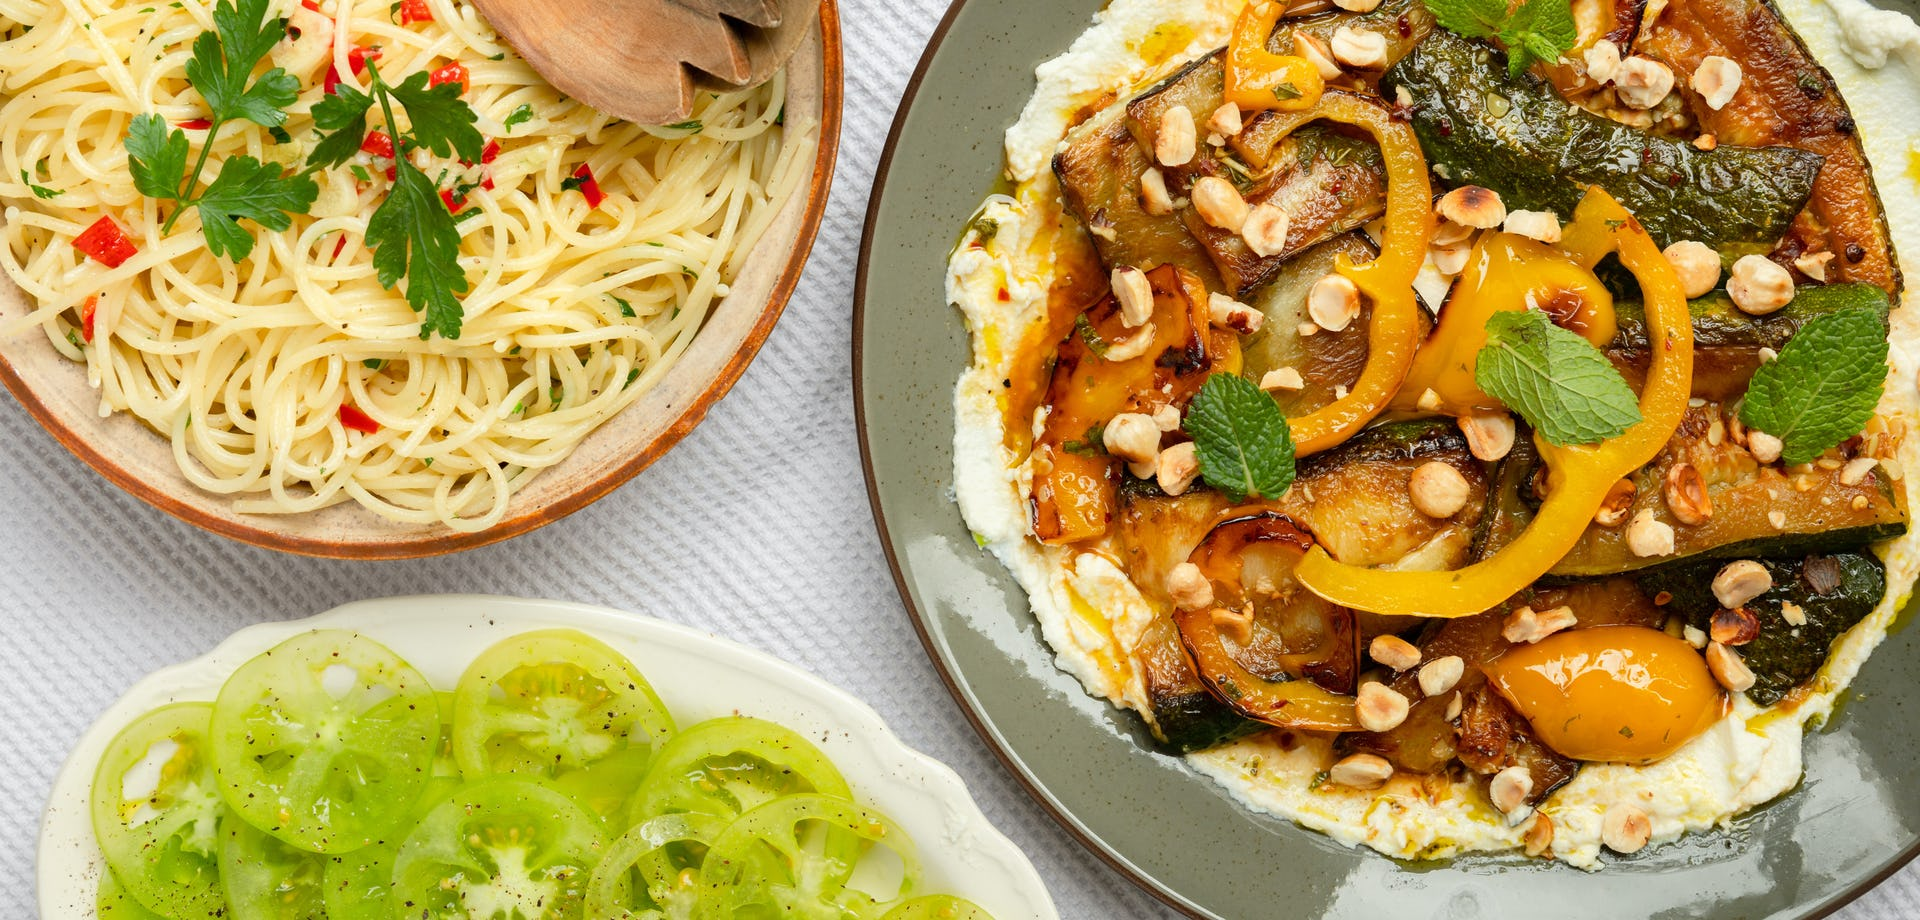 Gekaramelizeerde groenten met citroenricotta spaghetti en green zebra tomaten   Maaltijdbox recepten